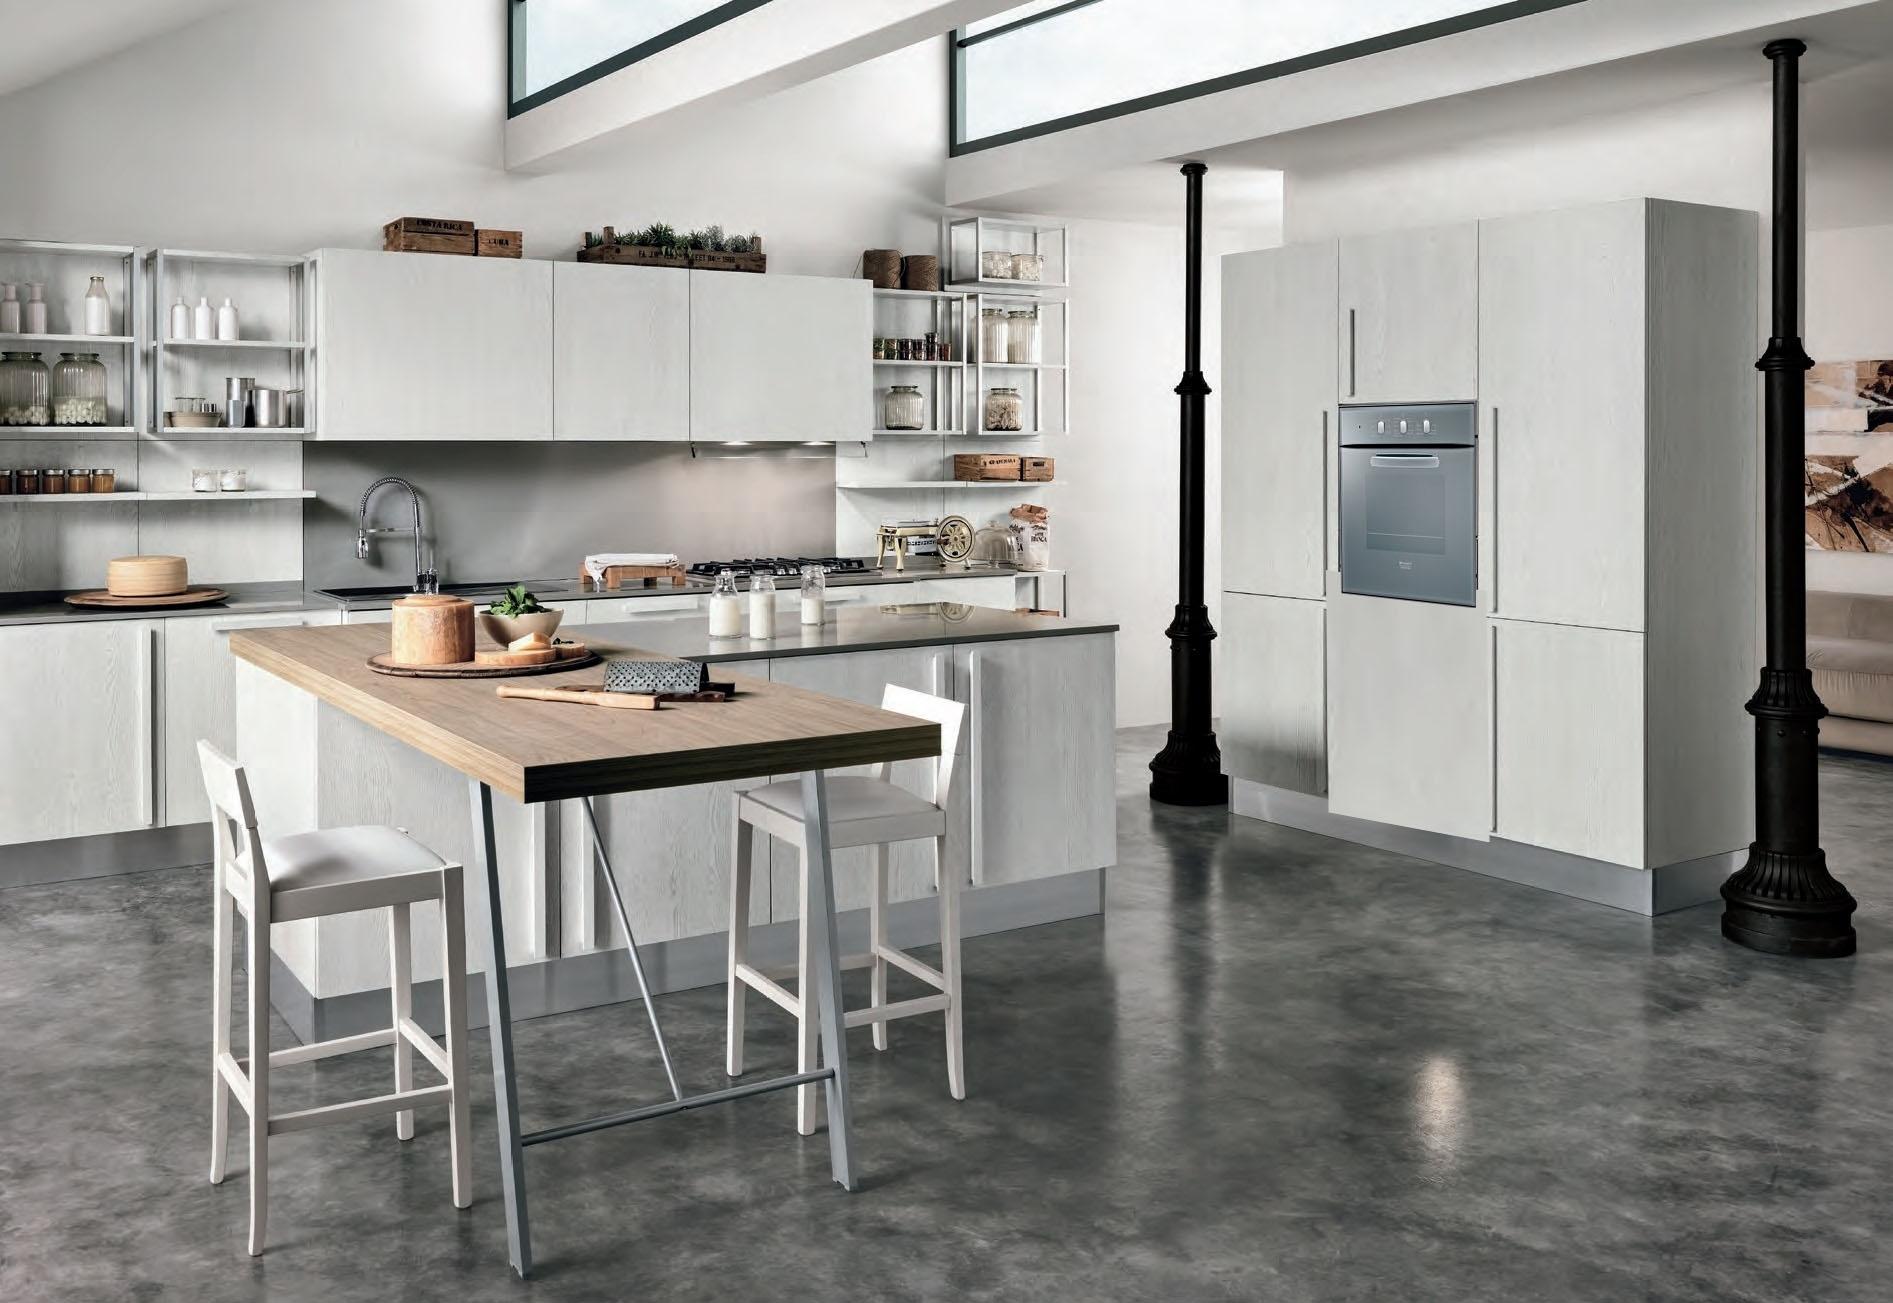 Cucine Torino: Offerte Online a Prezzi Scontati